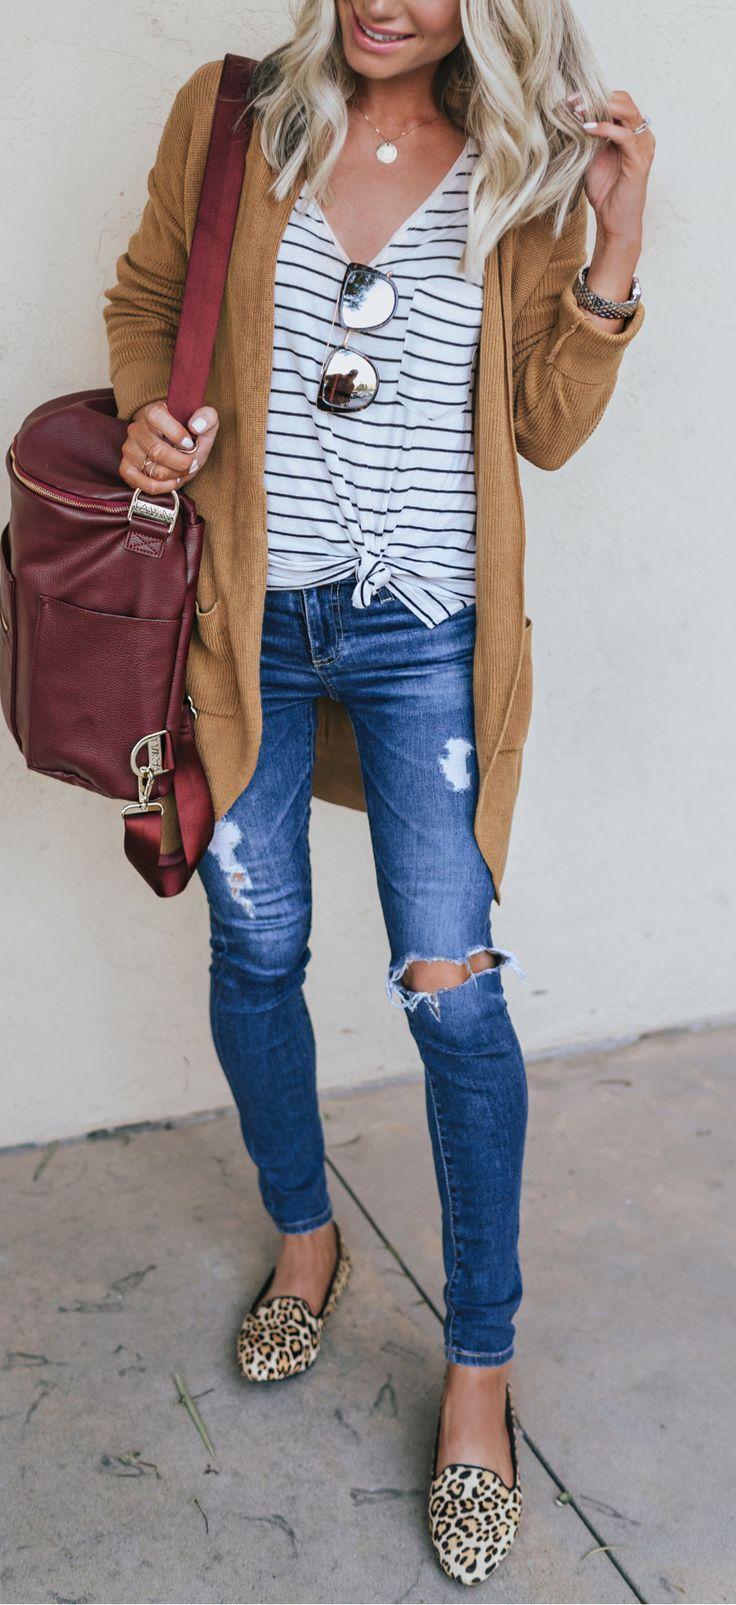 fd4236471d3 Mustard cardigan striped shirt blue jeans nude flats